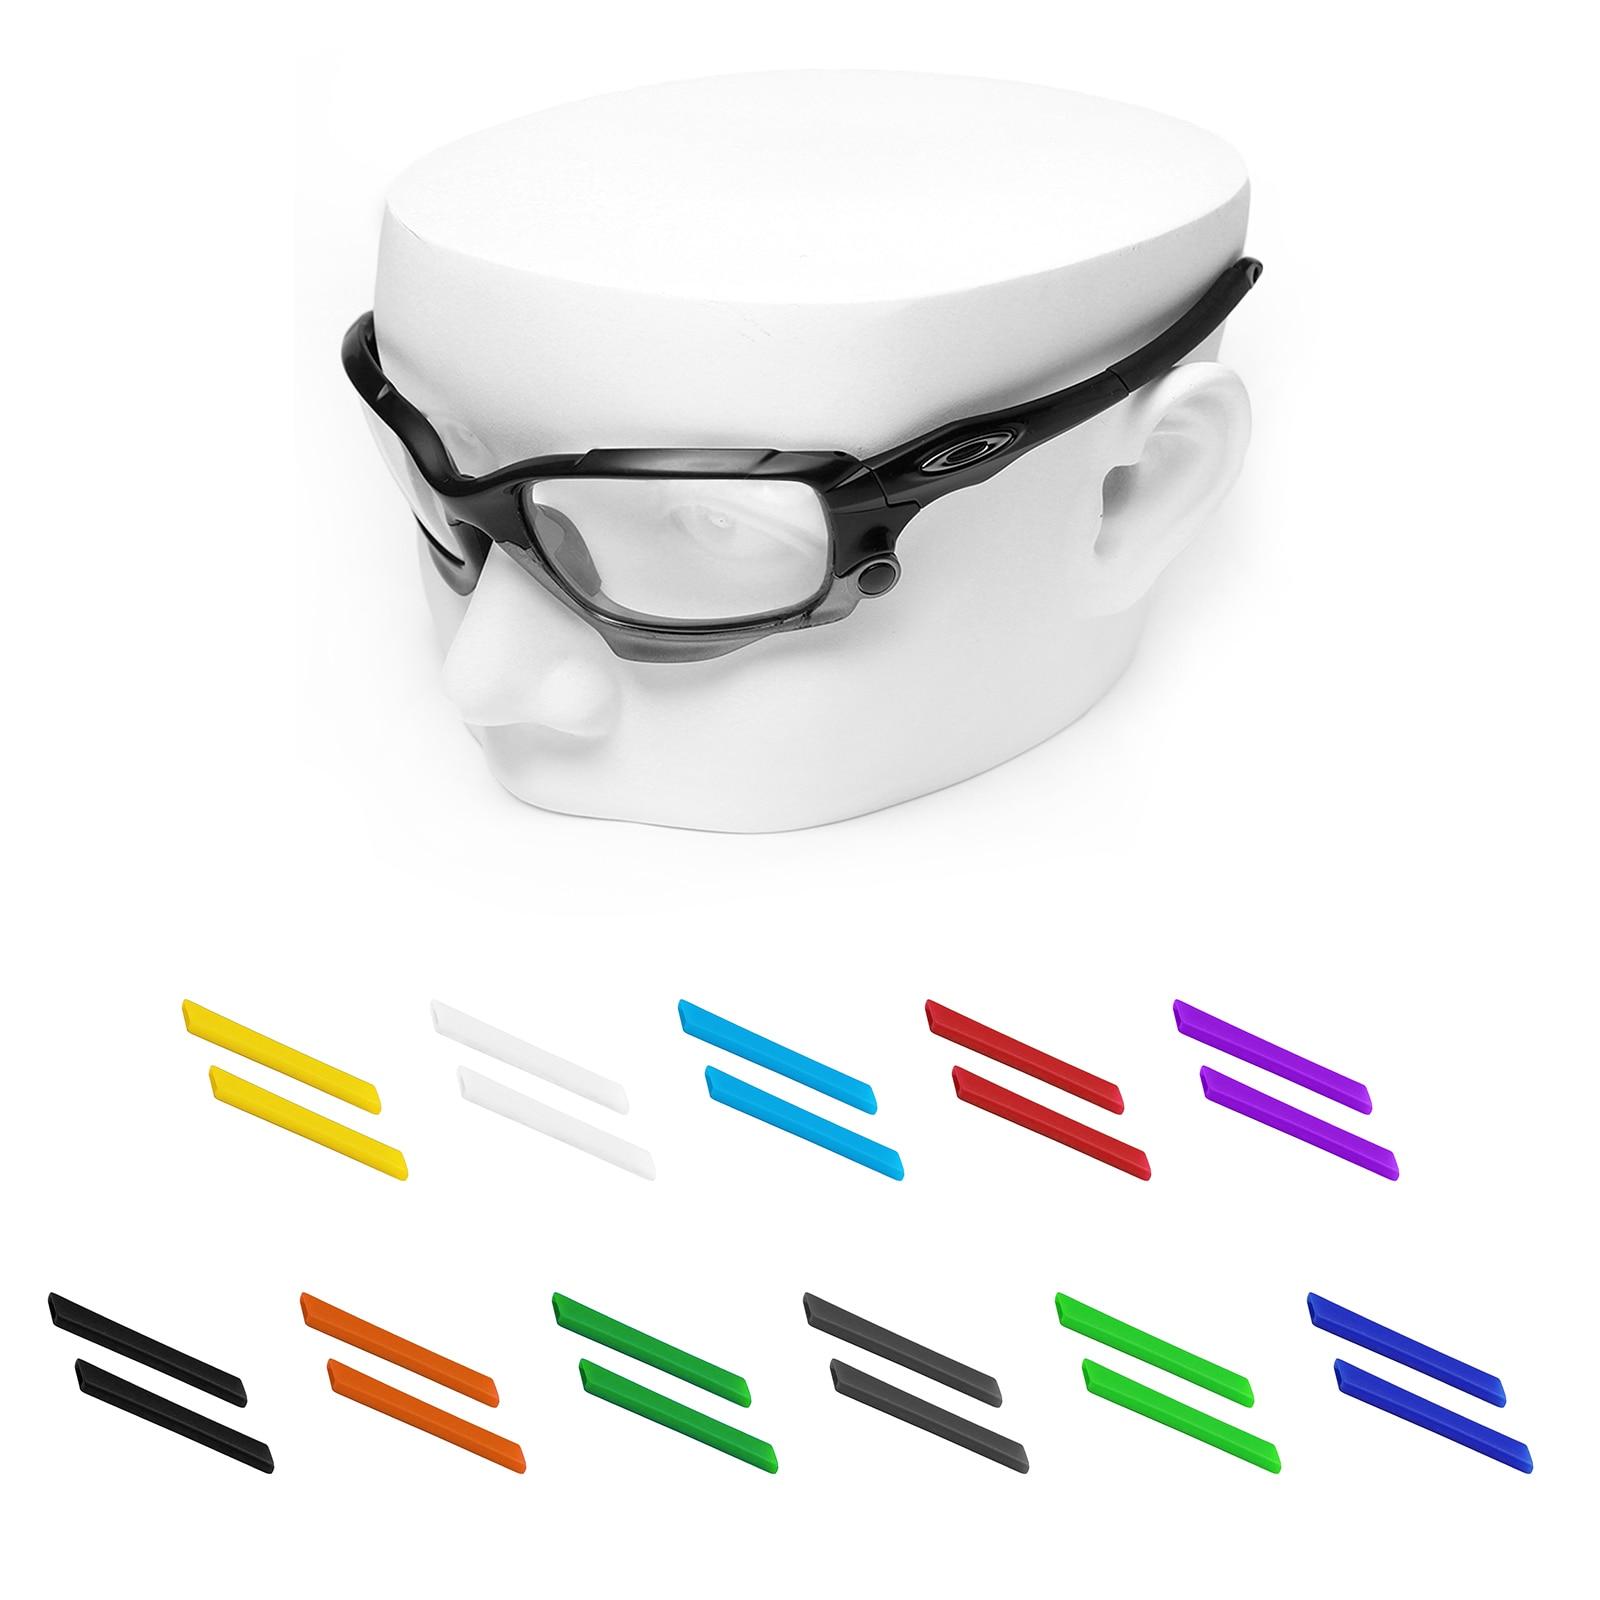 OOWLIT Rubber Ear Socks For Jawbone/Racing Jacket Sunglasses